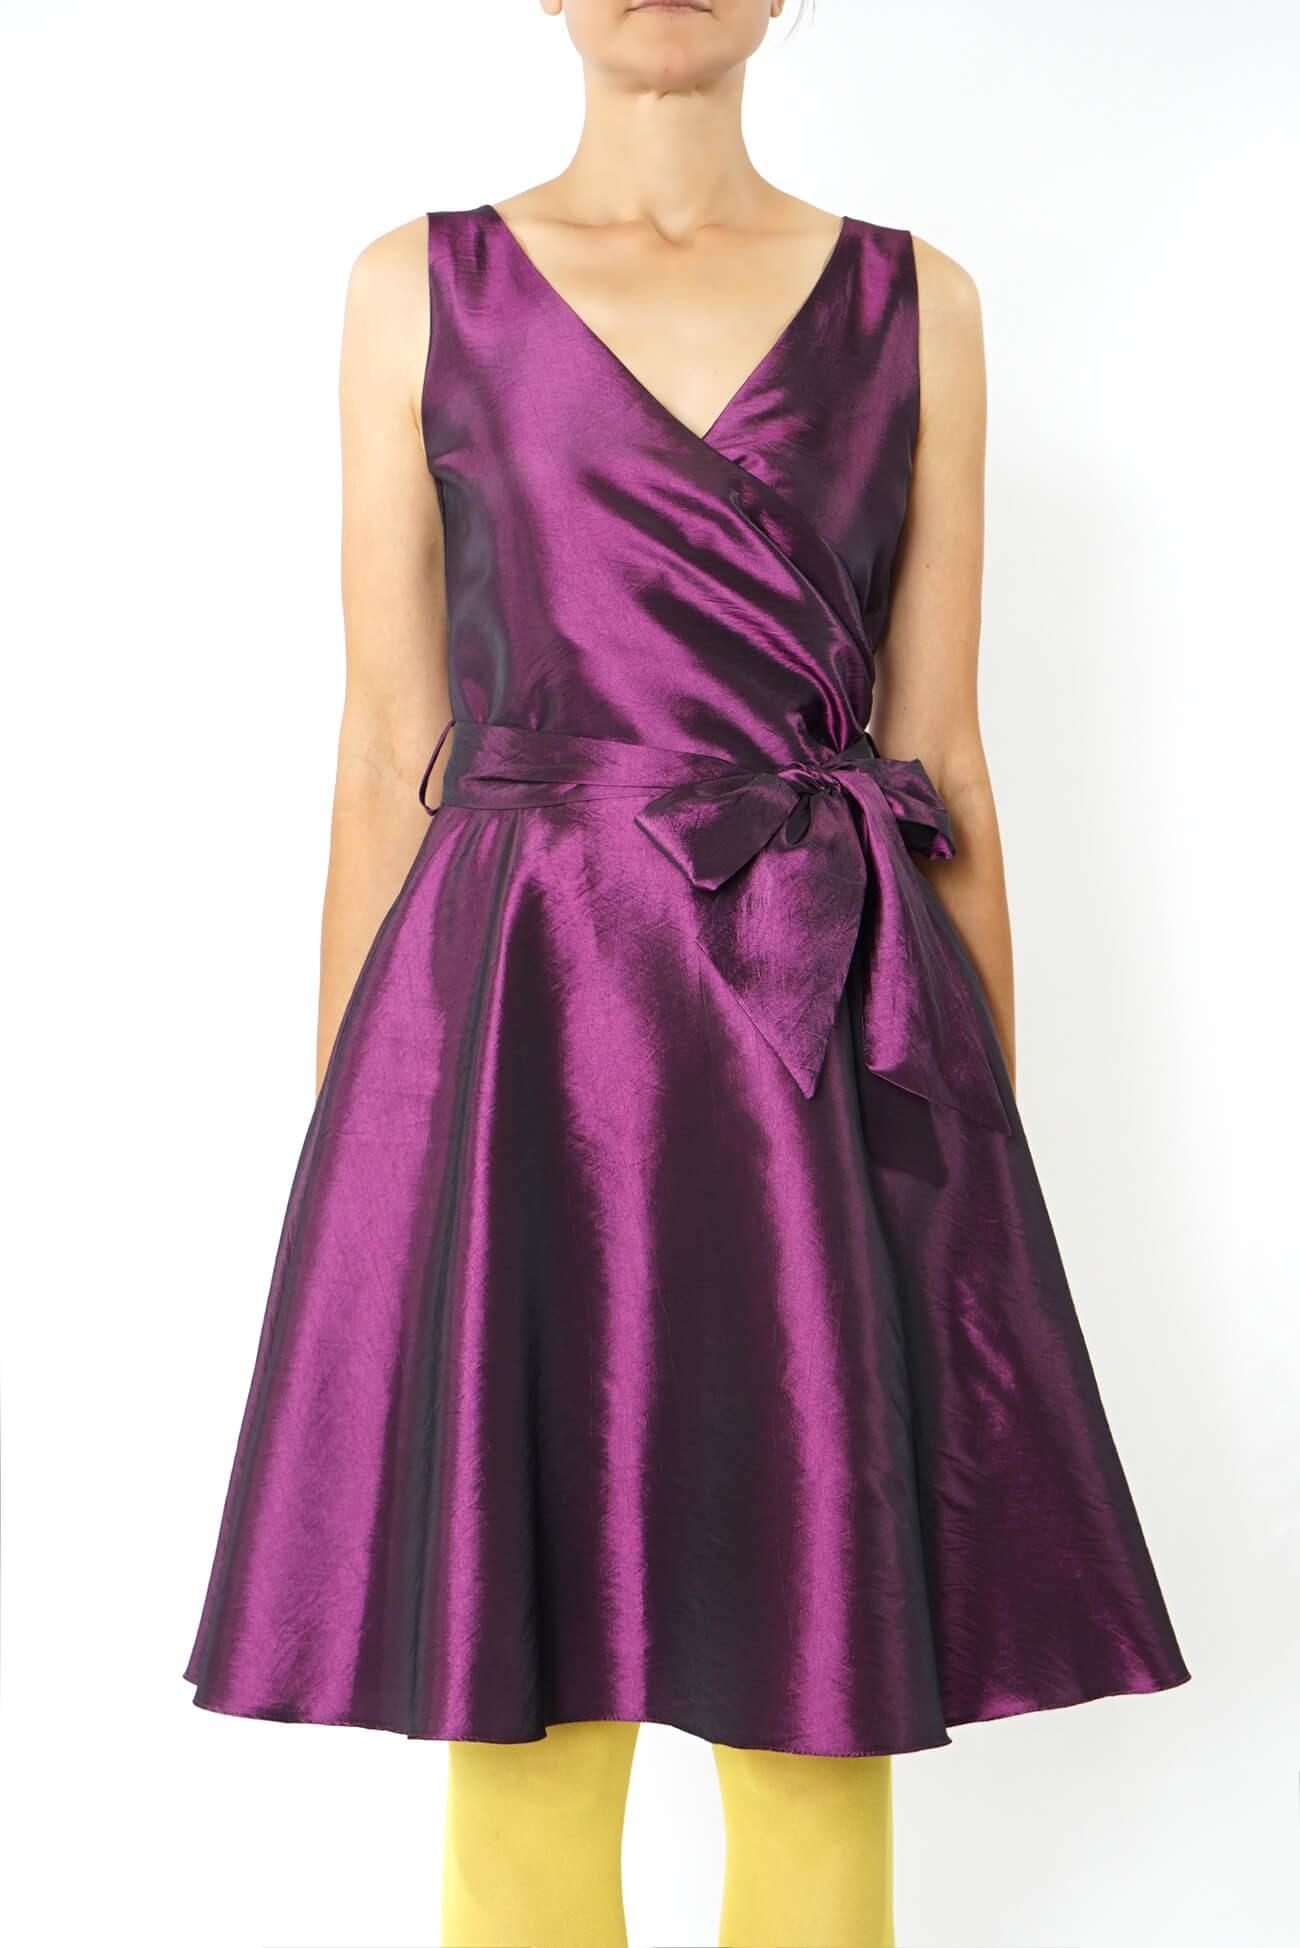 rochie midi petrecuta peste bust